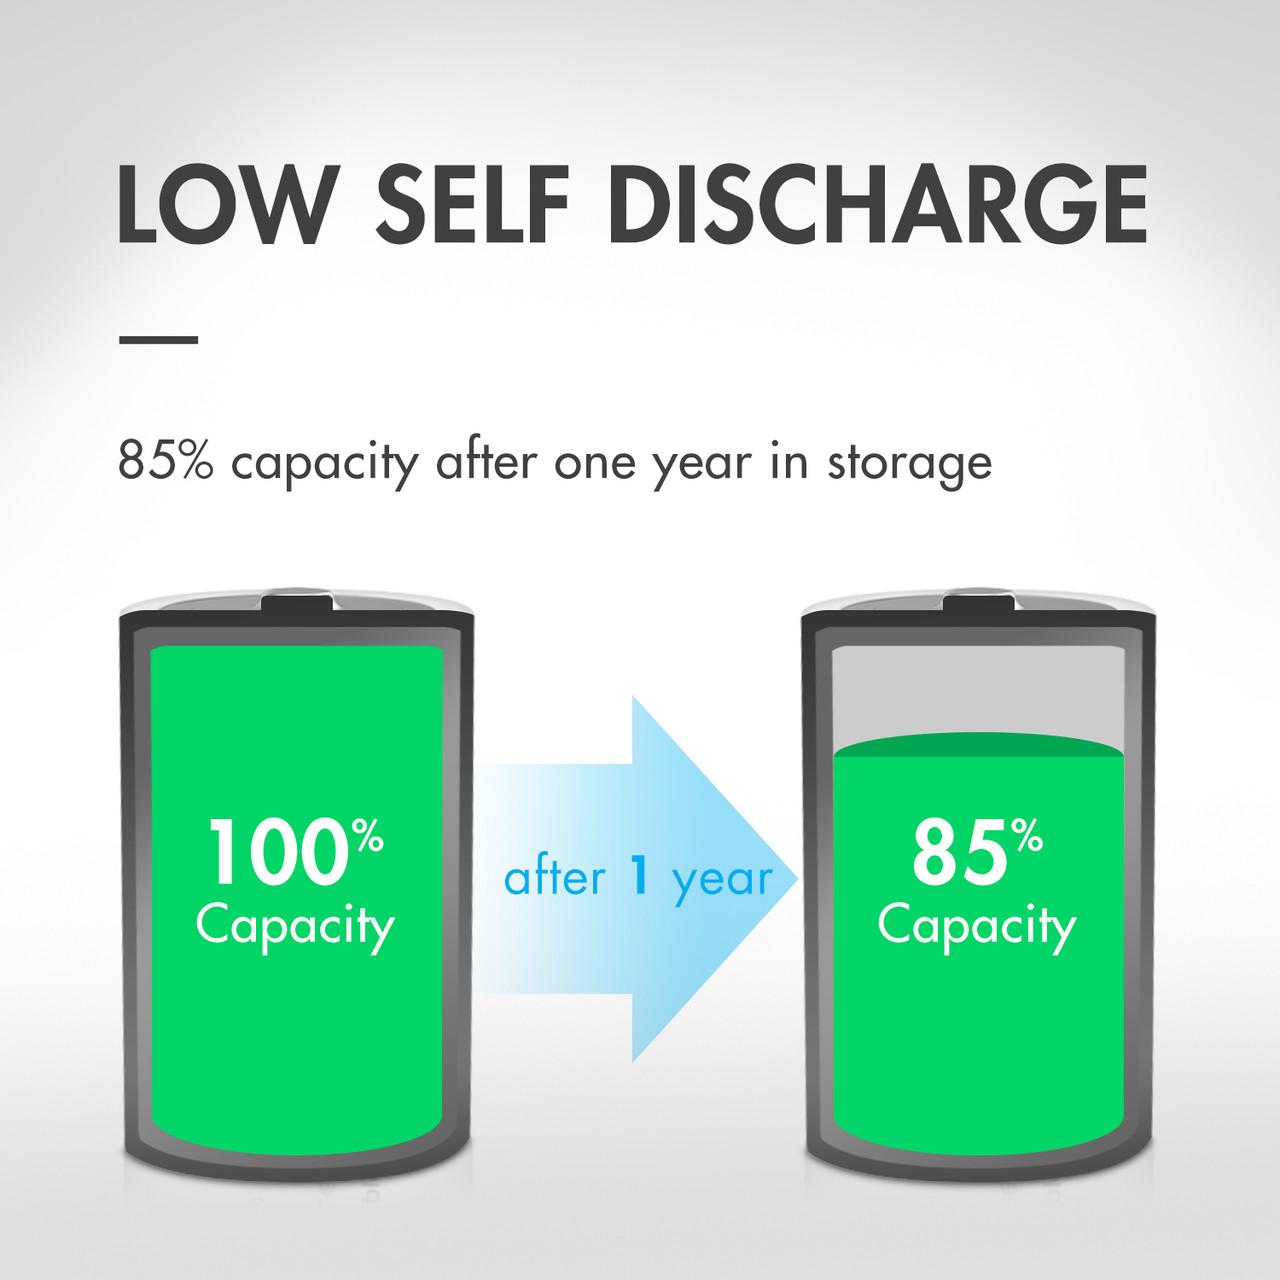 2-pack (Card), Tenergy Centura NiMH 9V 200mAh Rechargeable Batteries